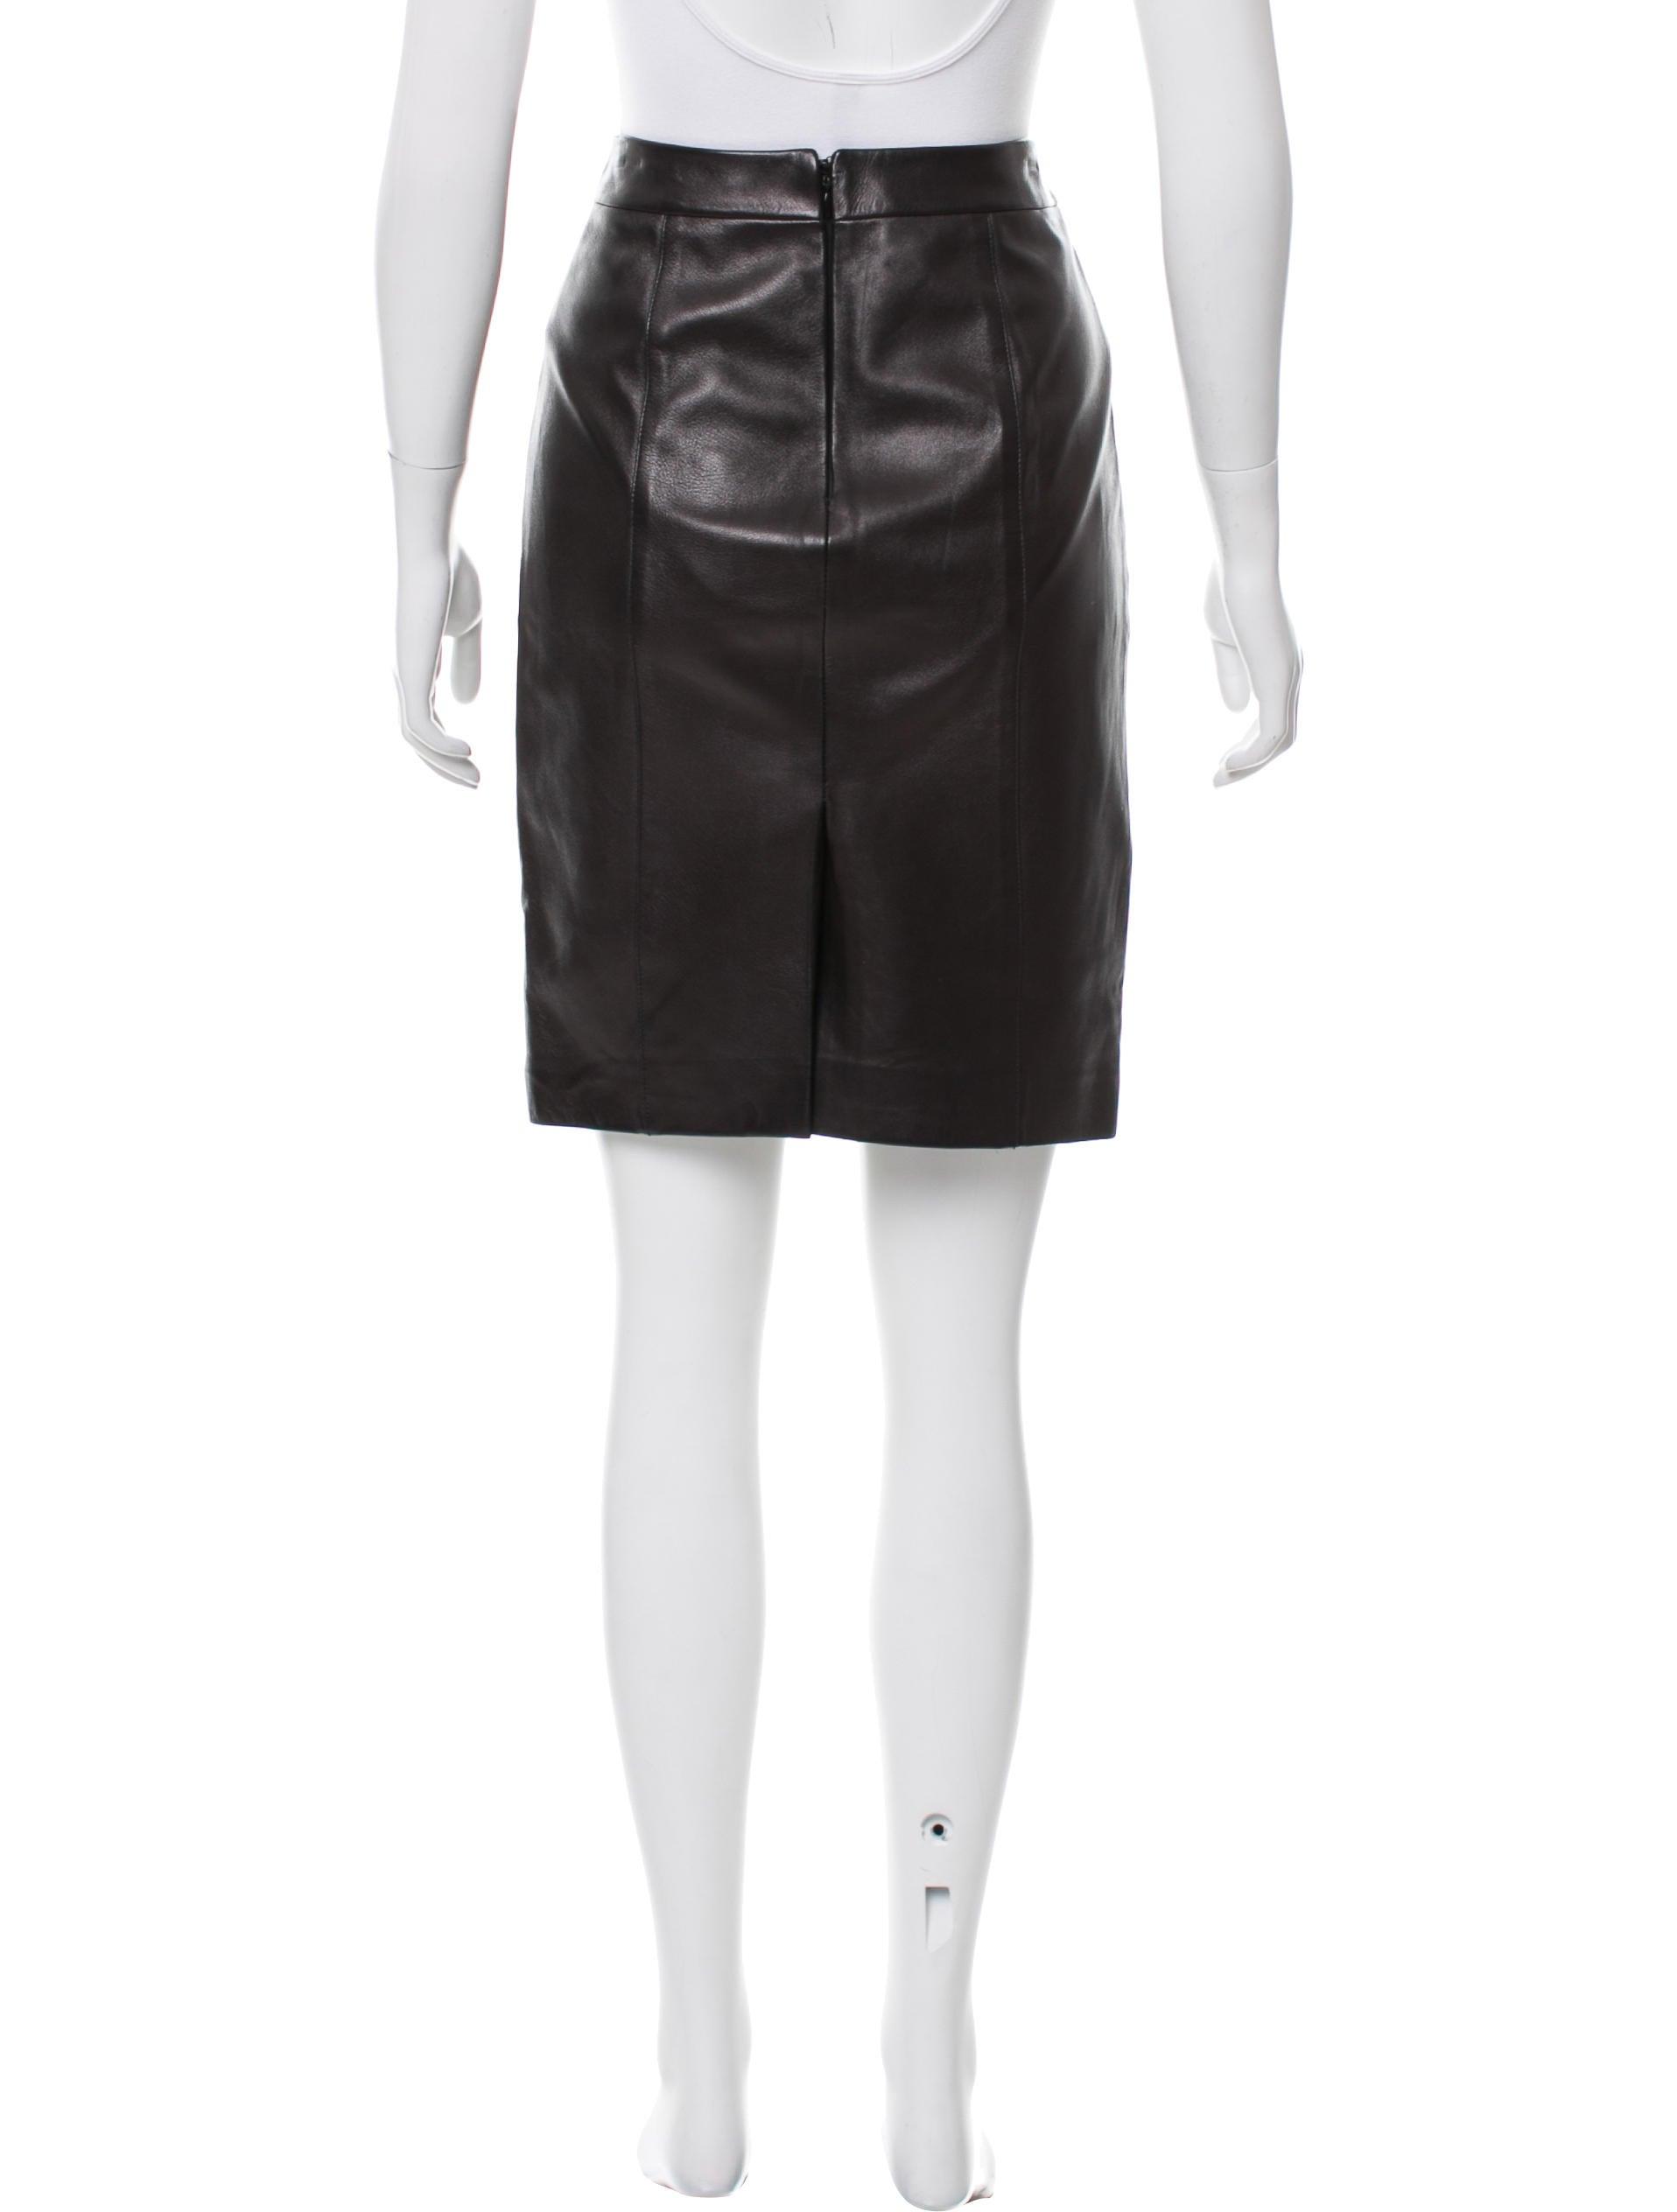 Michael Kors Knee-Length Leather Skirt - Clothing - MIC53761 | The RealReal